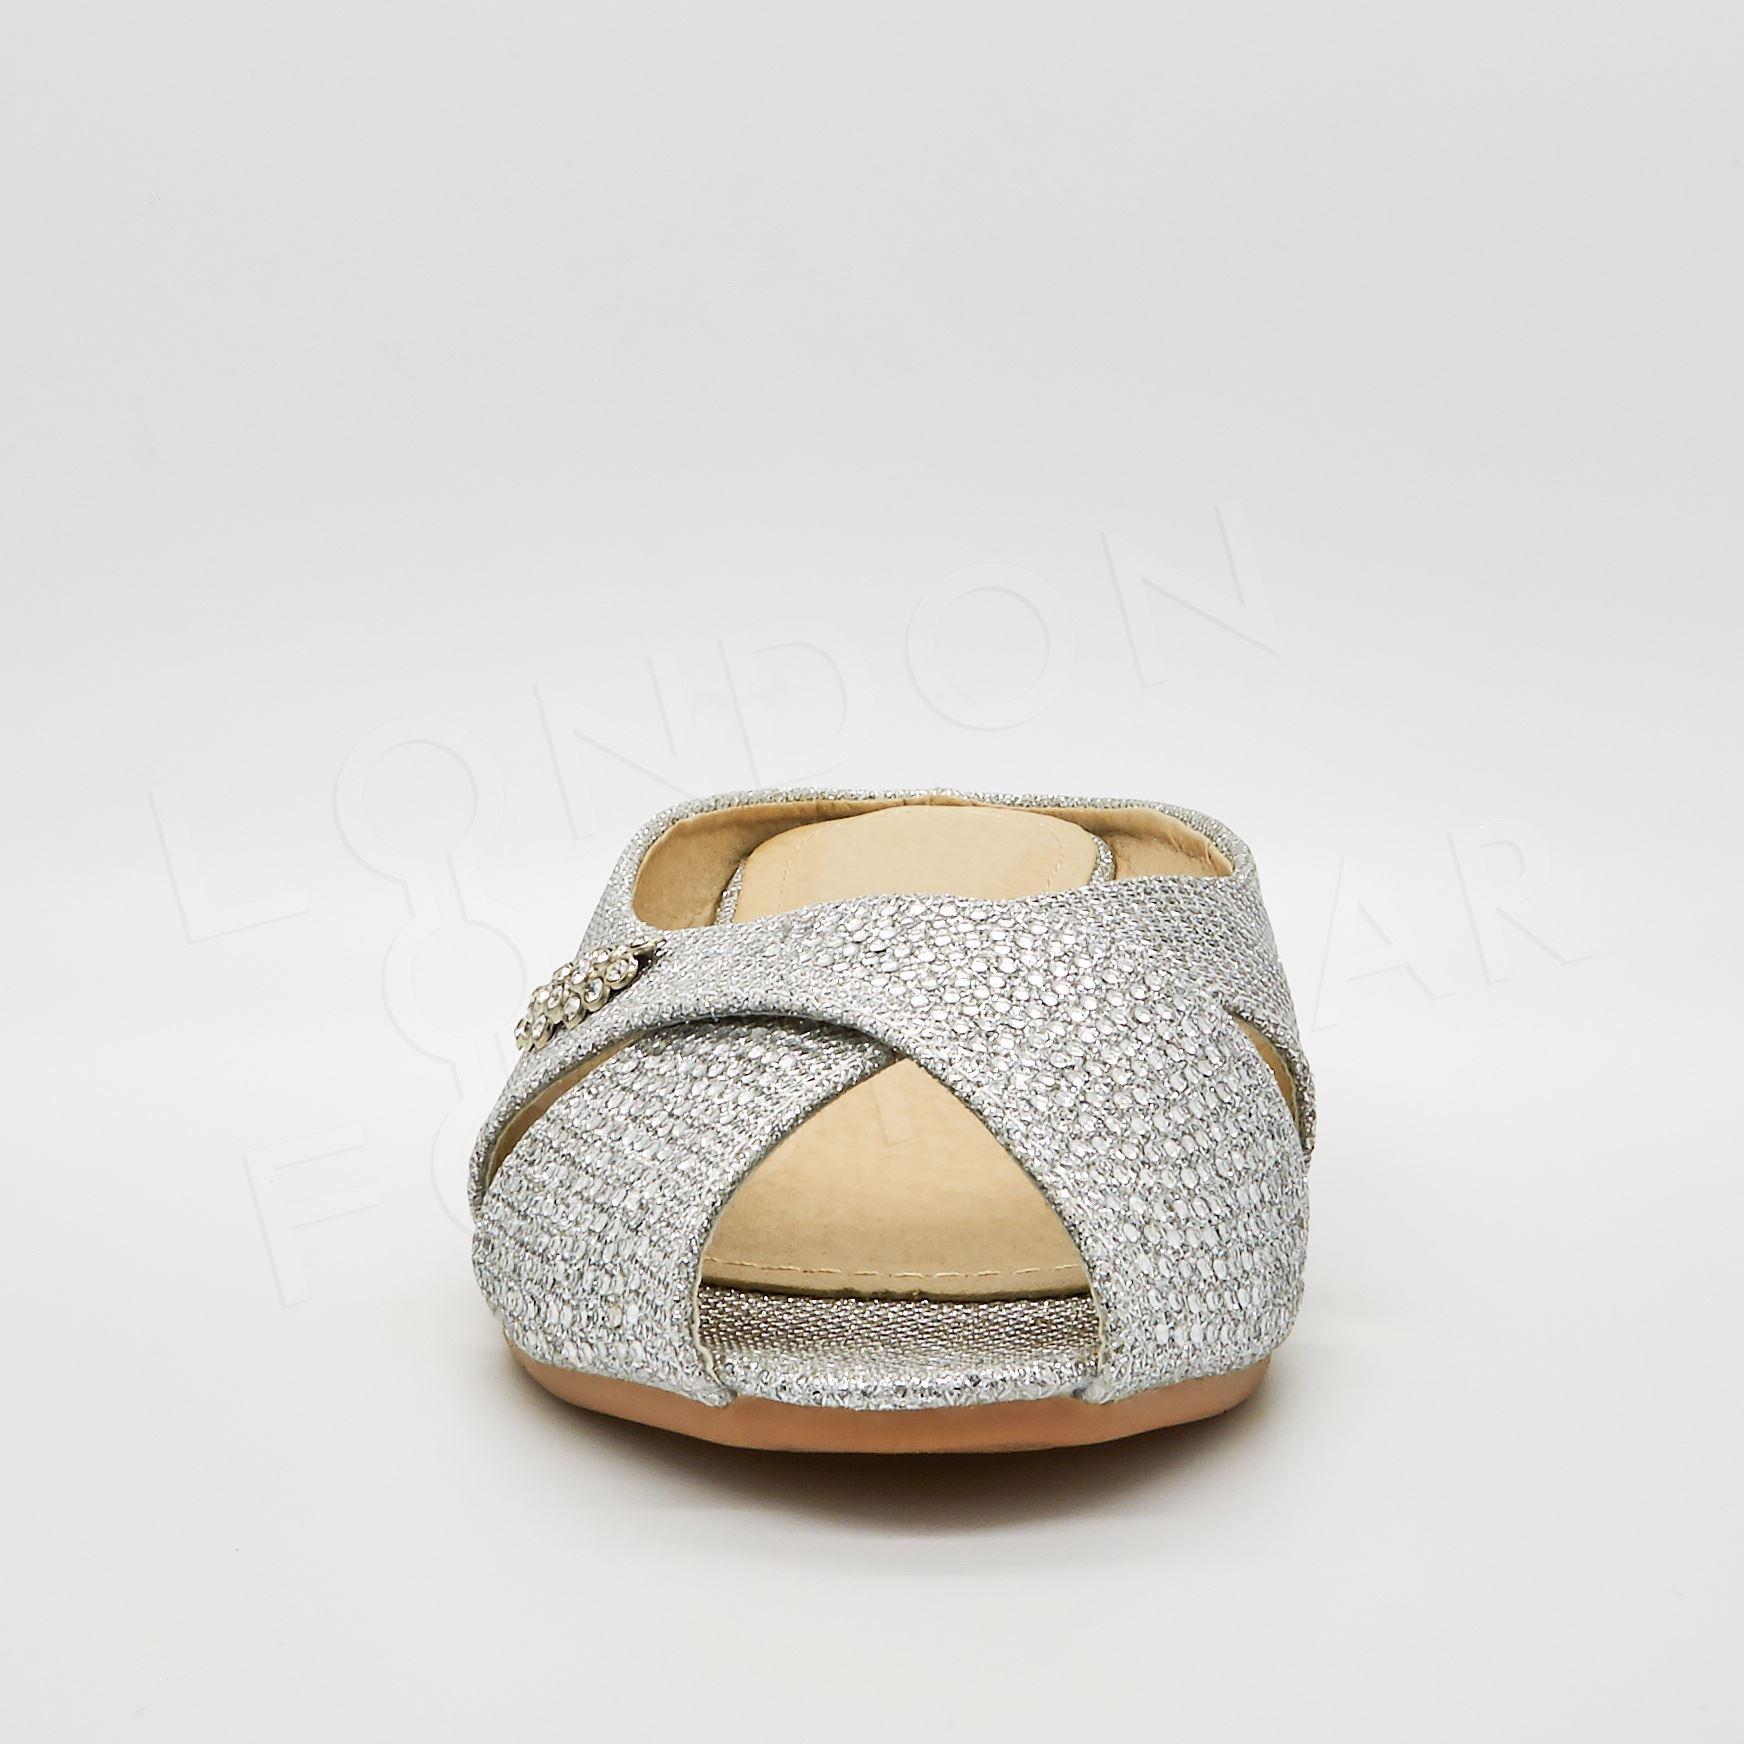 e8972f8bfd6 New Girls Diamante Glitter Ballet Pumps Peep Toe Ballerina Flat ...